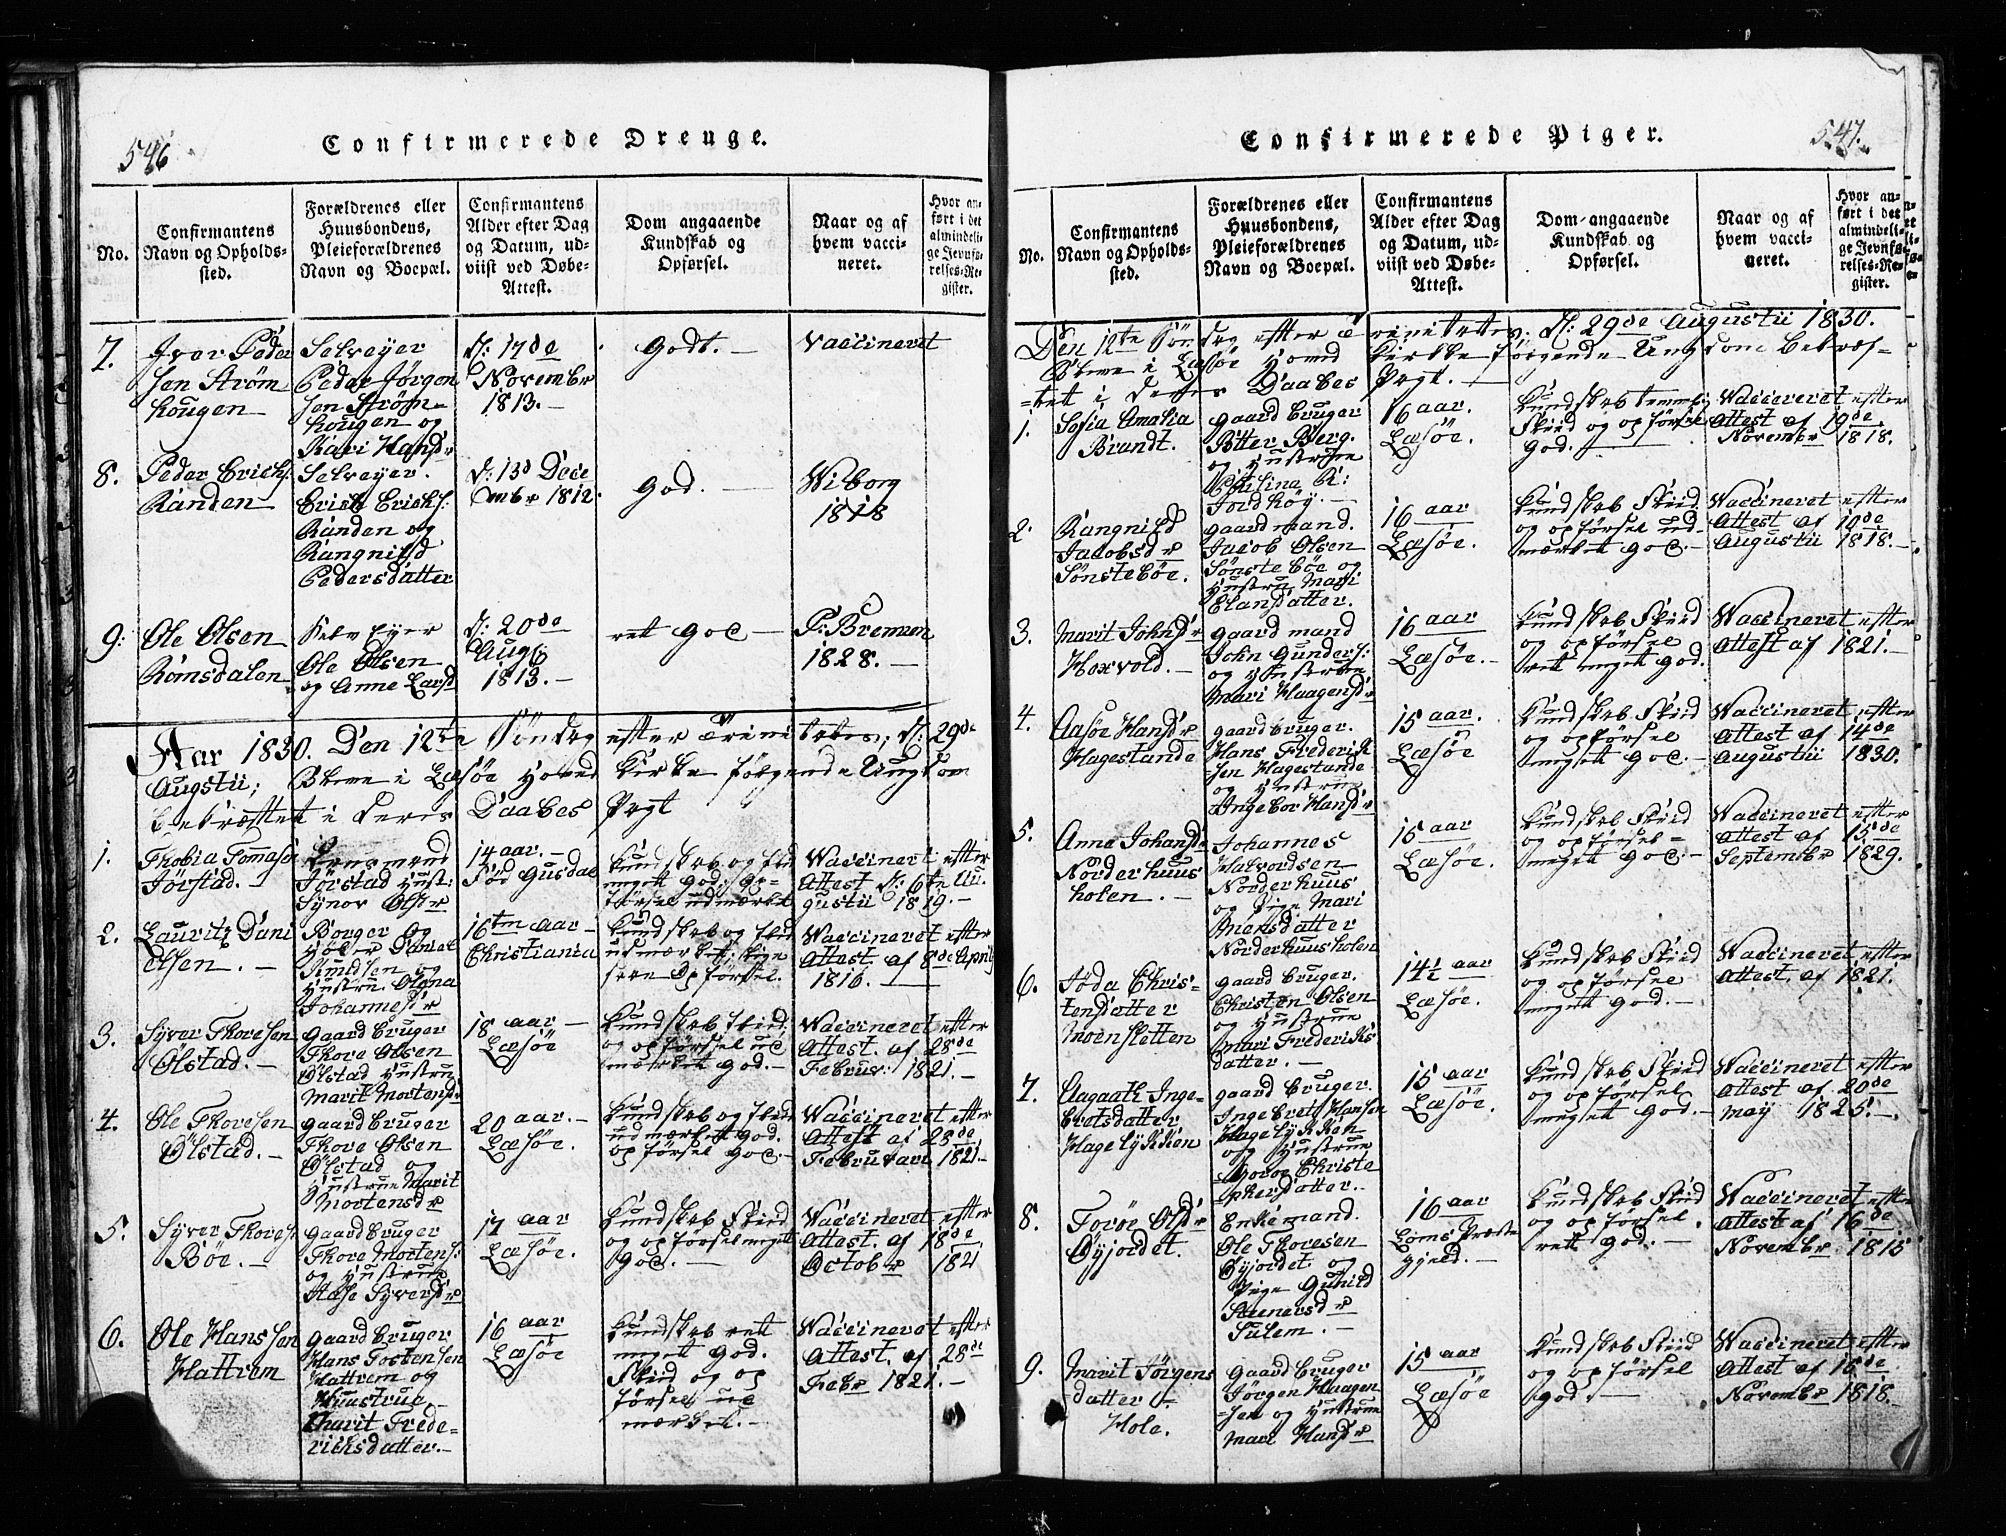 SAH, Lesja prestekontor, Klokkerbok nr. 1, 1820-1831, s. 546-547